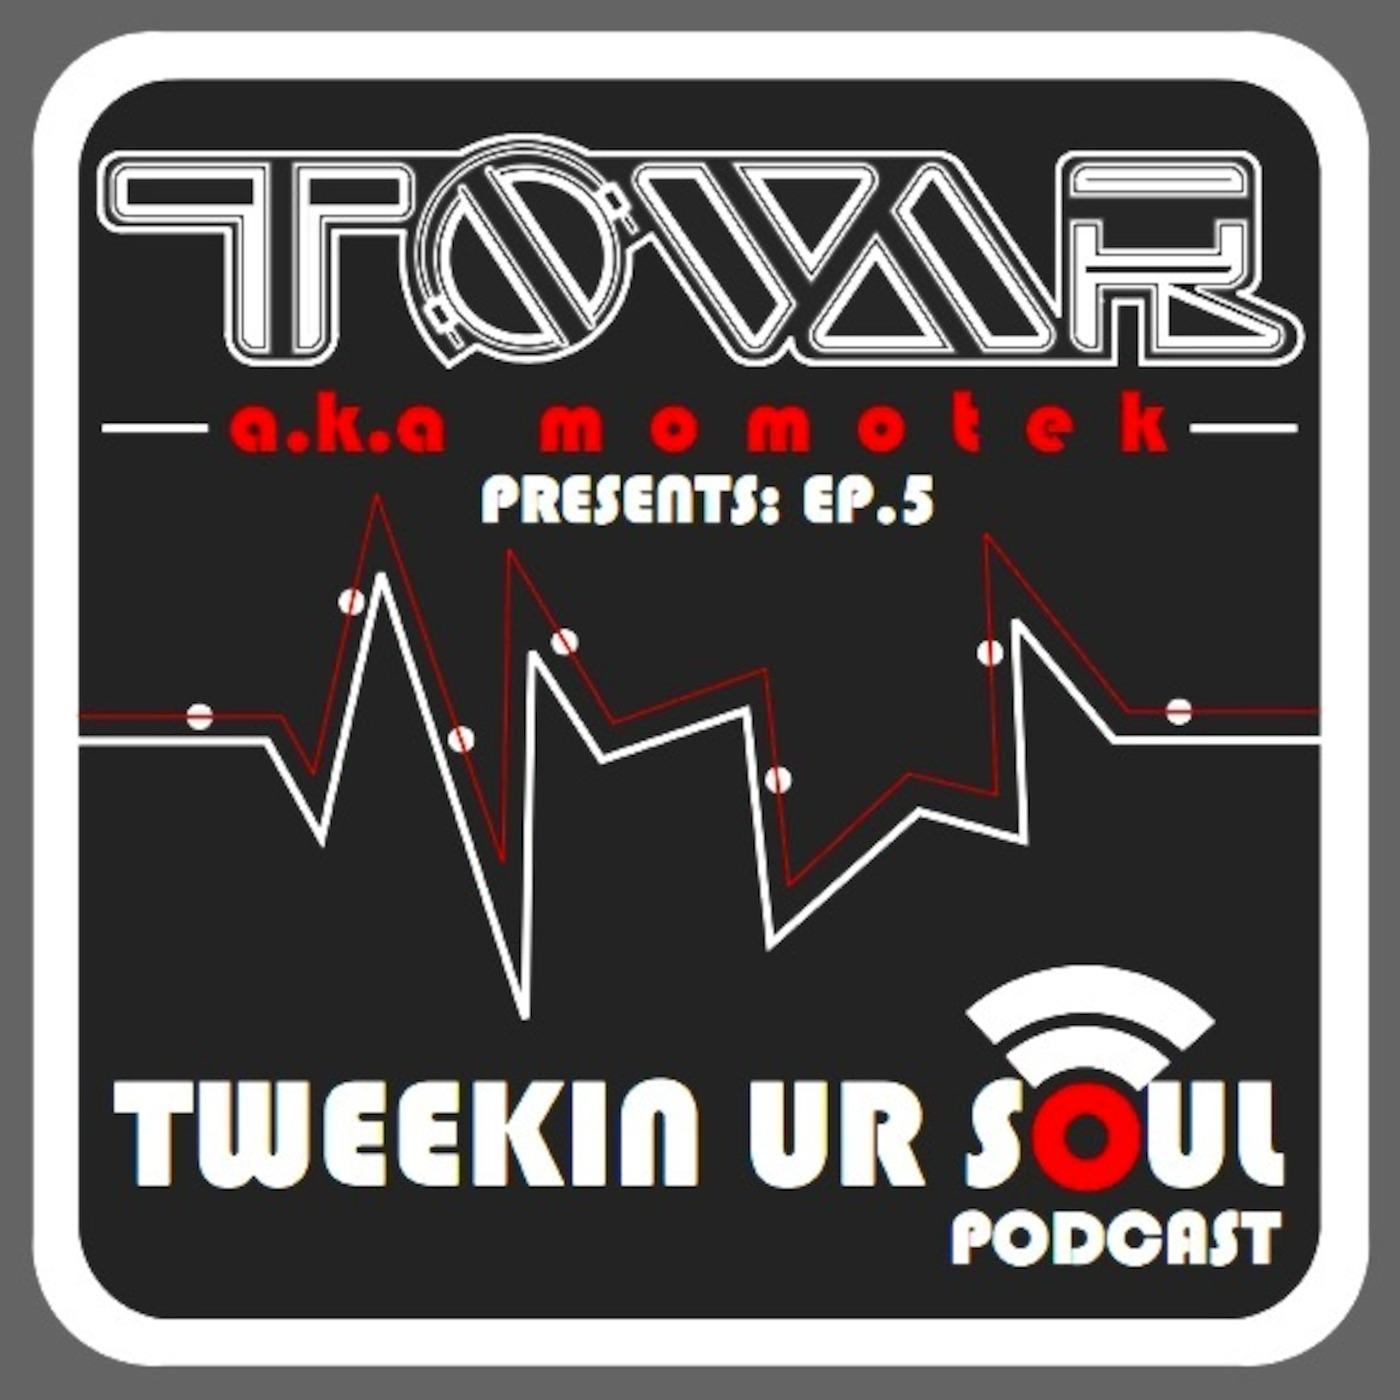 Tweekin Ur Soul: Ep 5 | Tovar Aka Momotek Tweekin Ur Soul